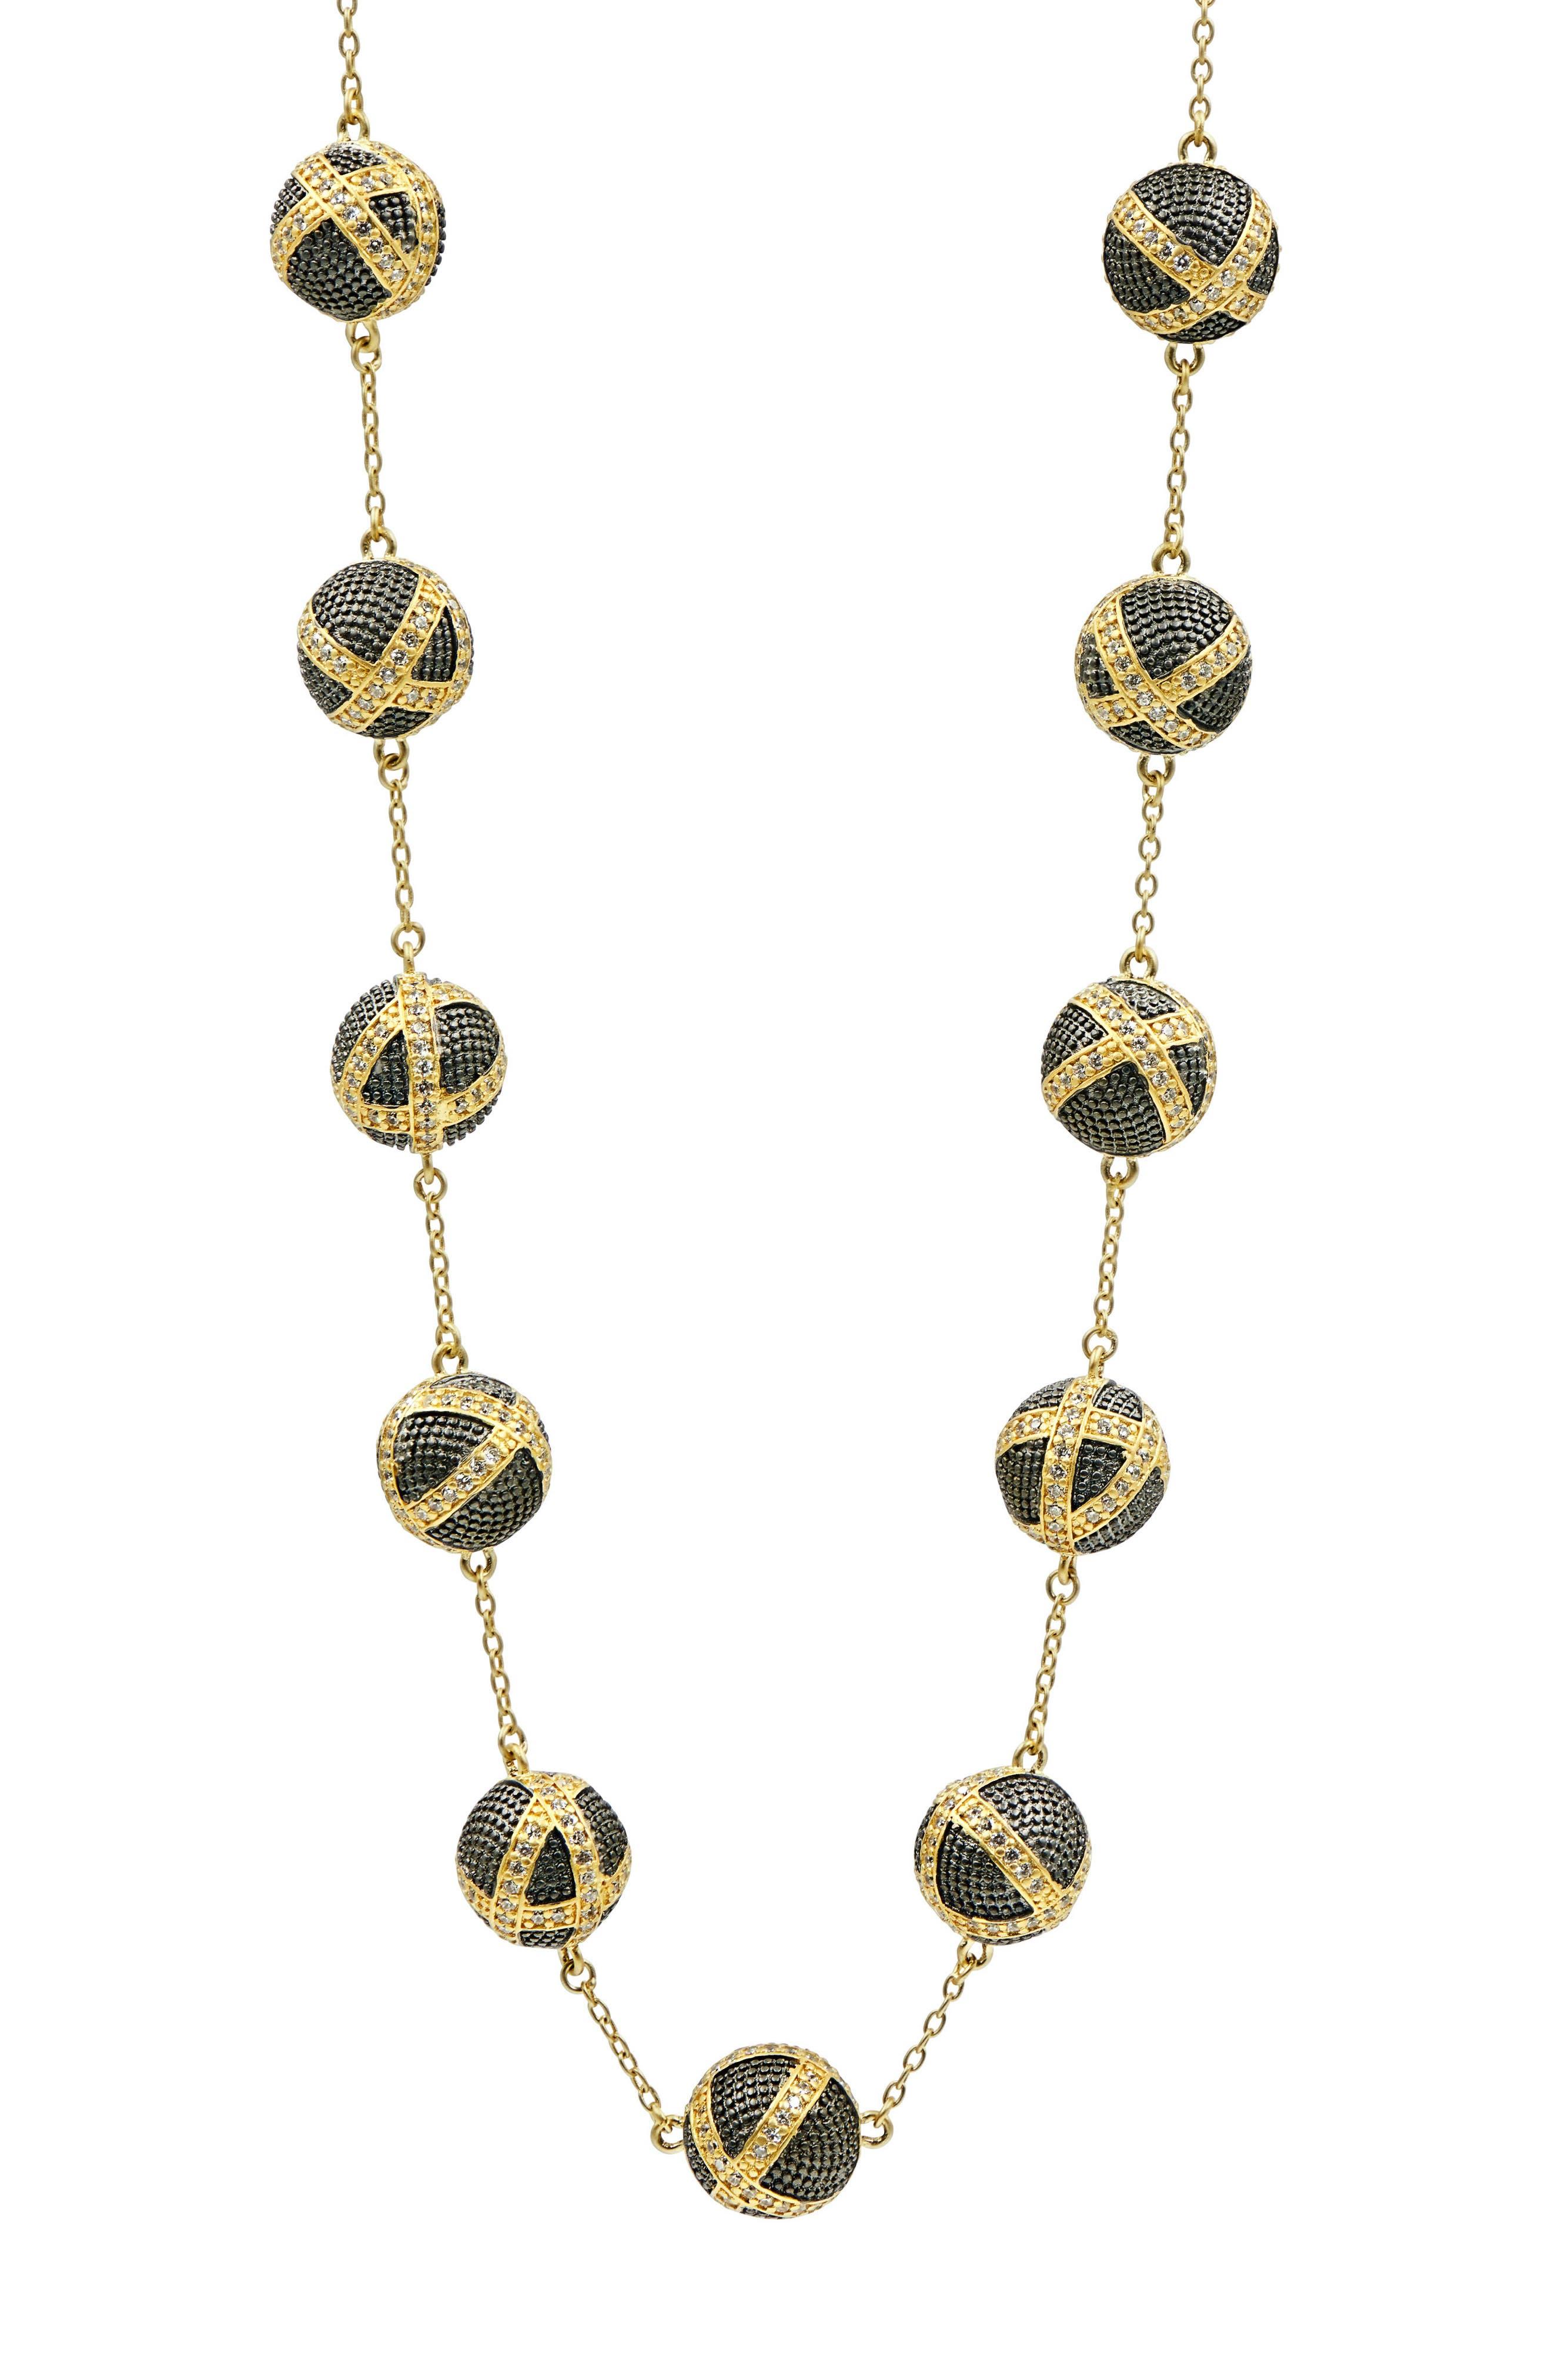 FREIDA ROTHMAN Textured Ornaments Collar Necklace